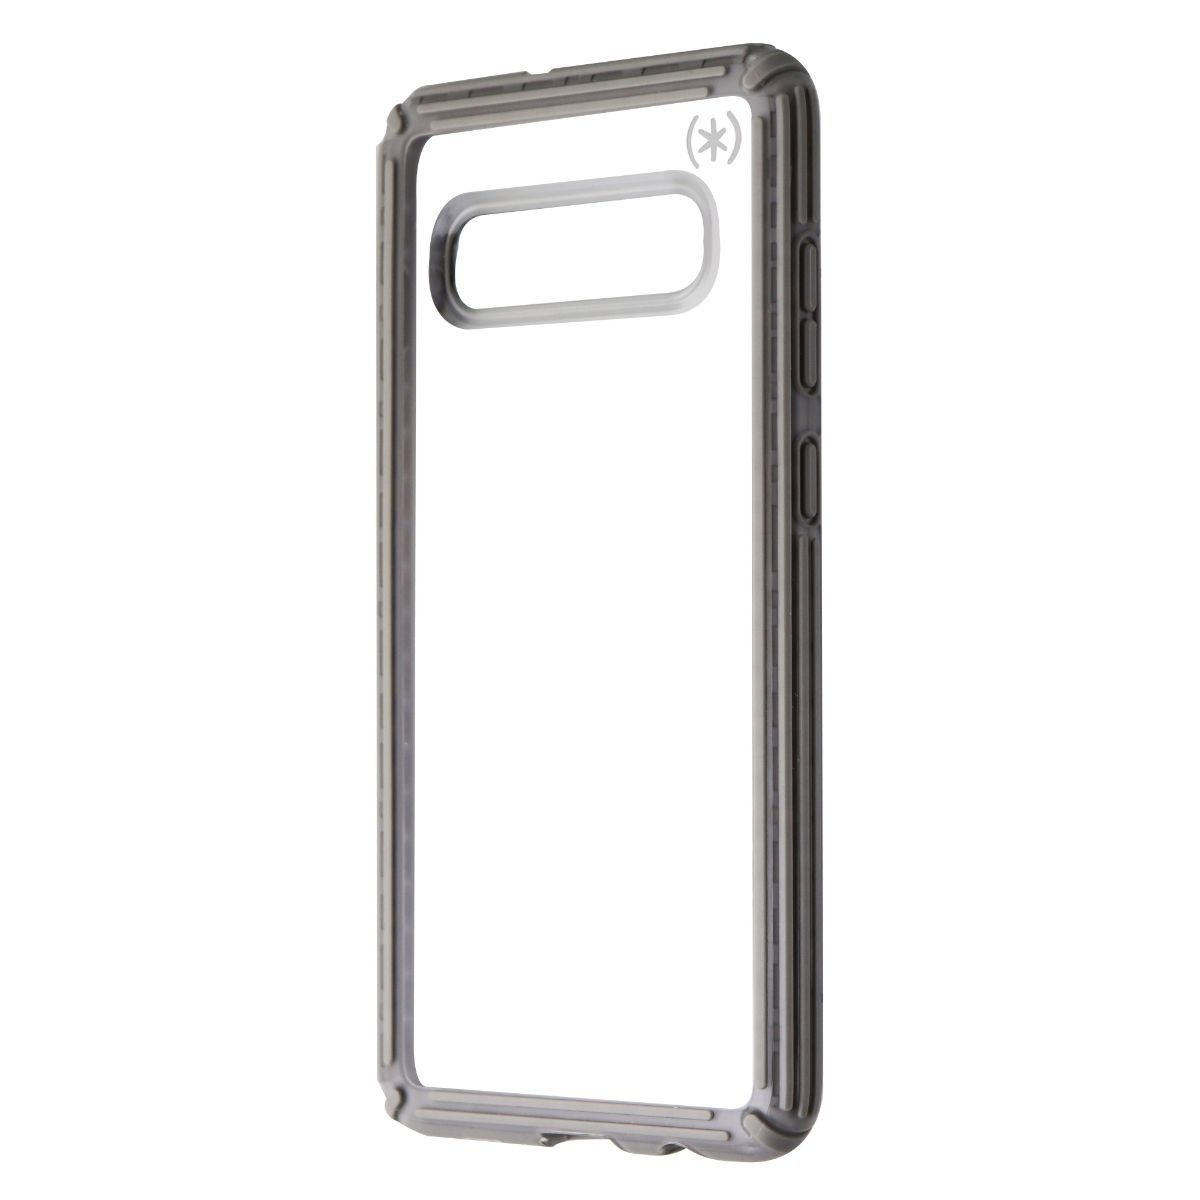 Speck Presidio V-Grip Series Case for Samsung Galaxy S10+ (Plus) - Clear / Gray